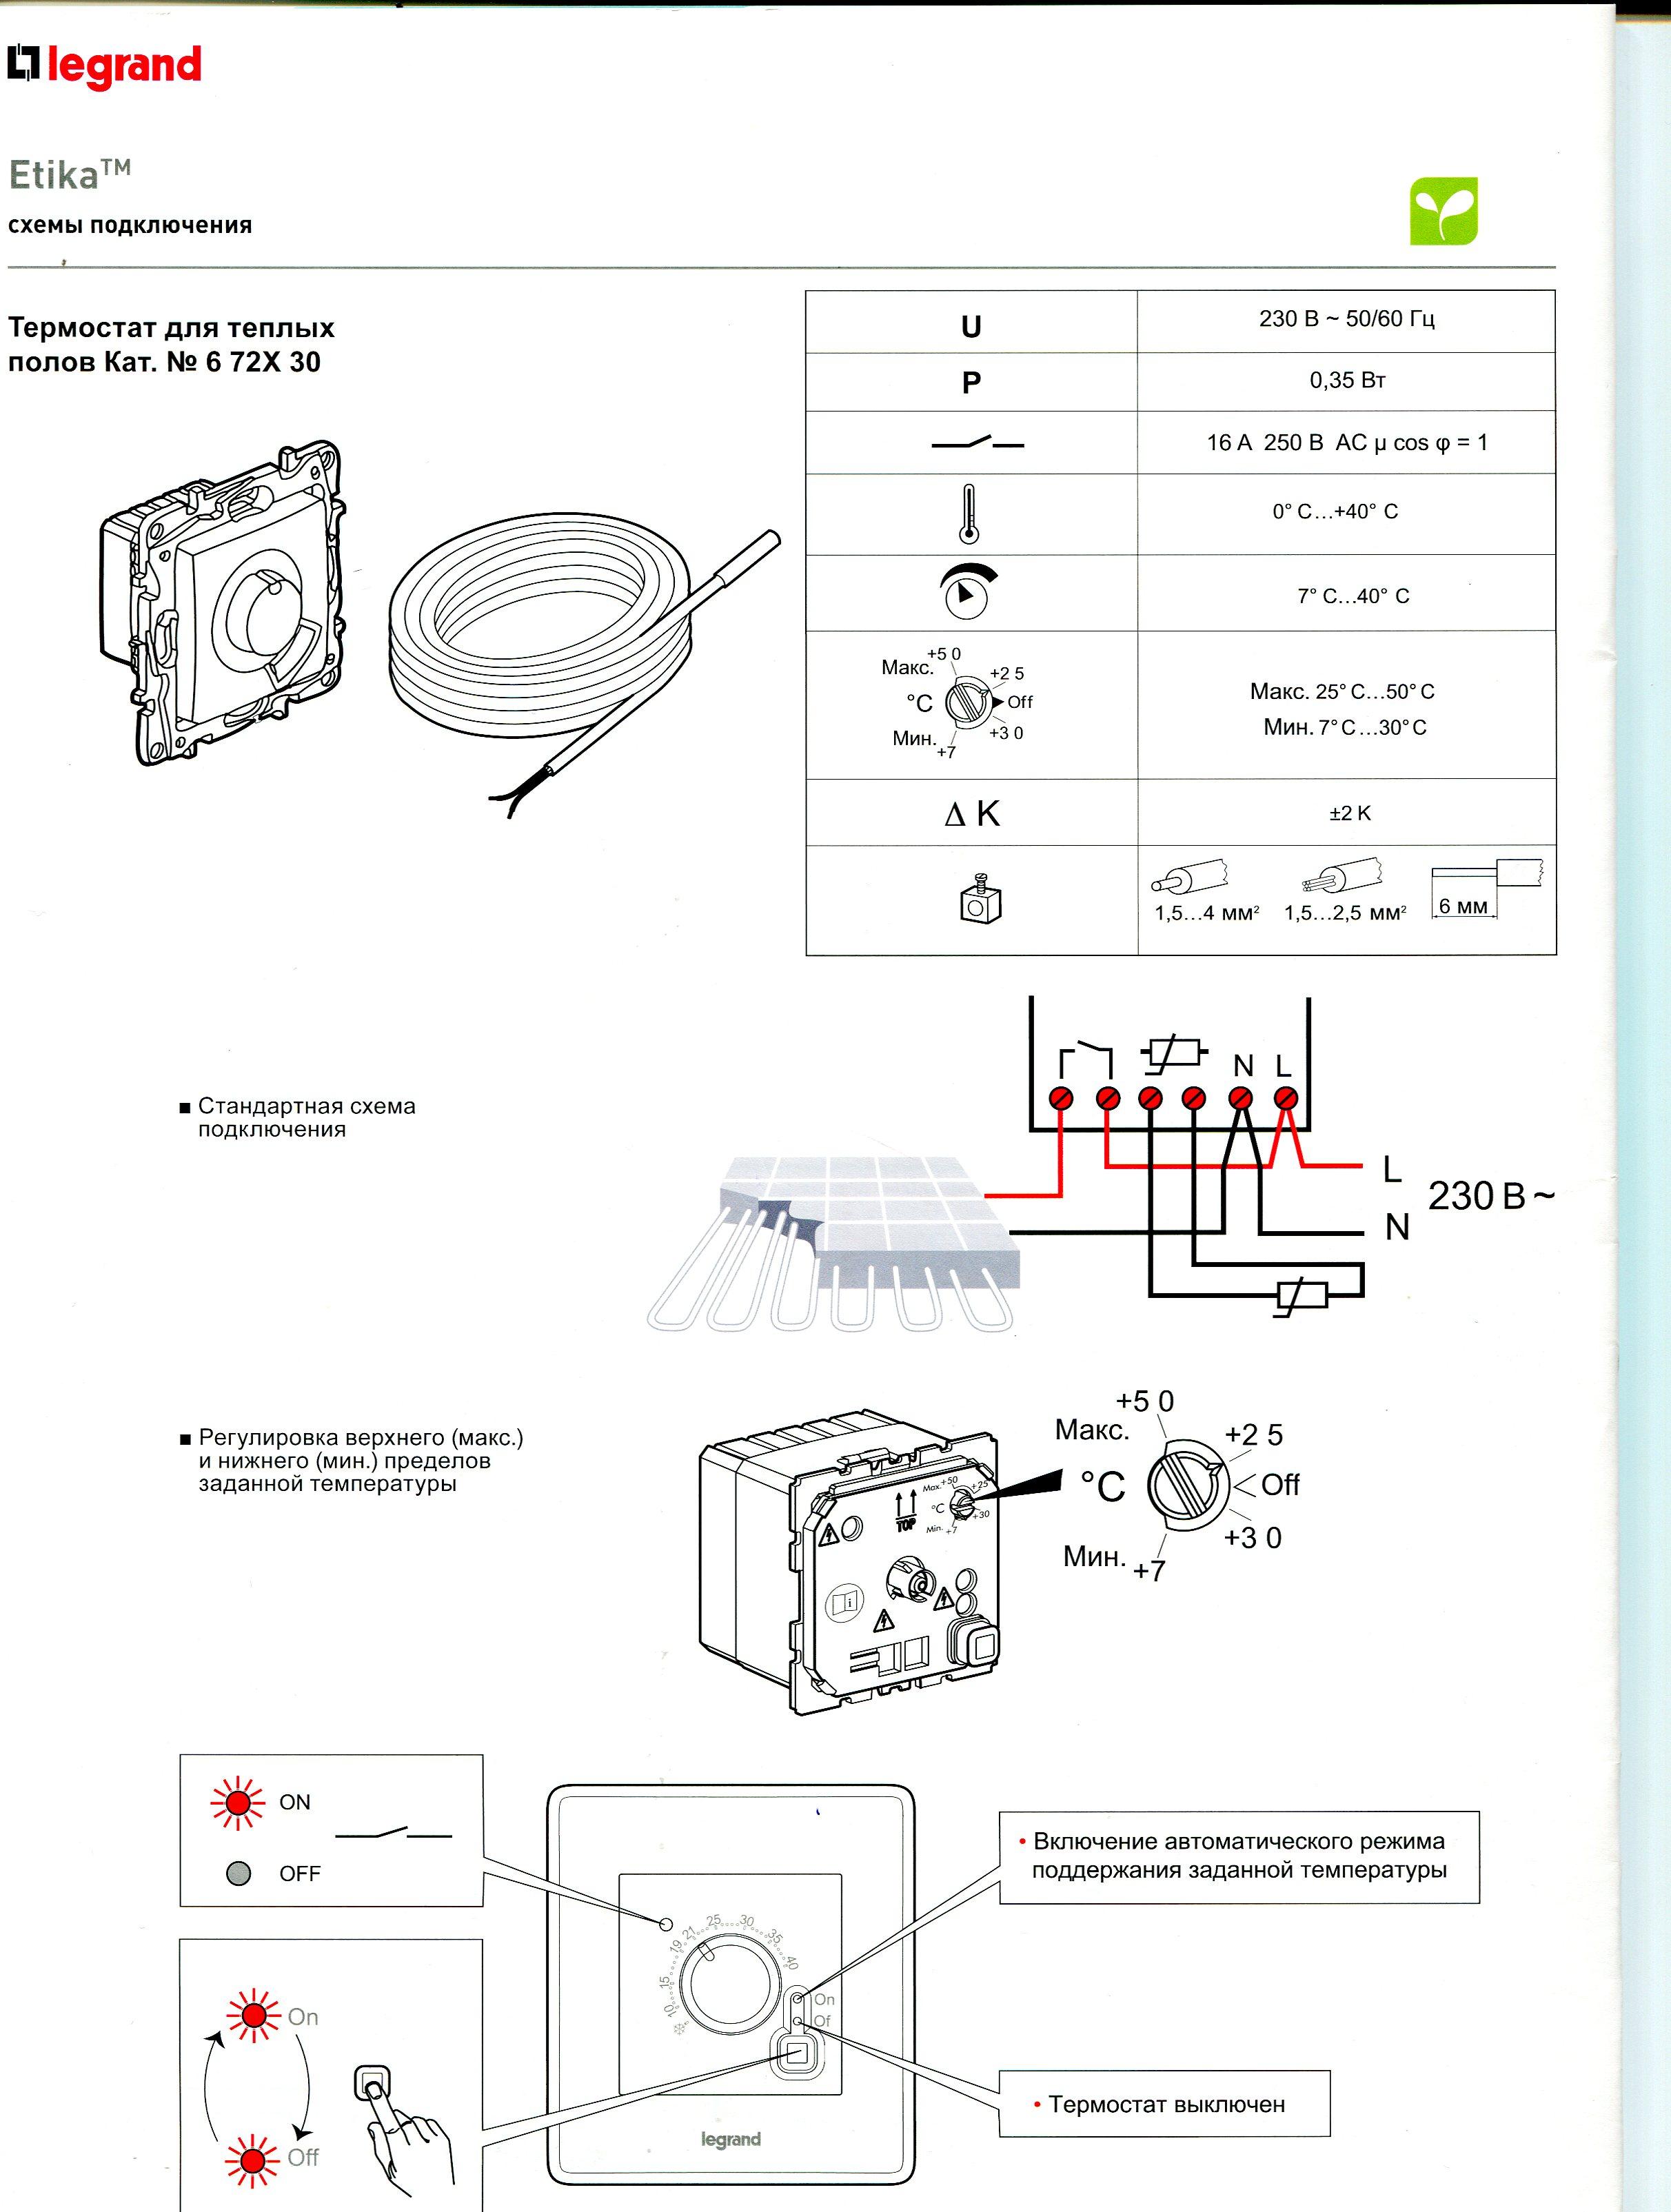 Тёплый пол схема подключения терморегулятора5